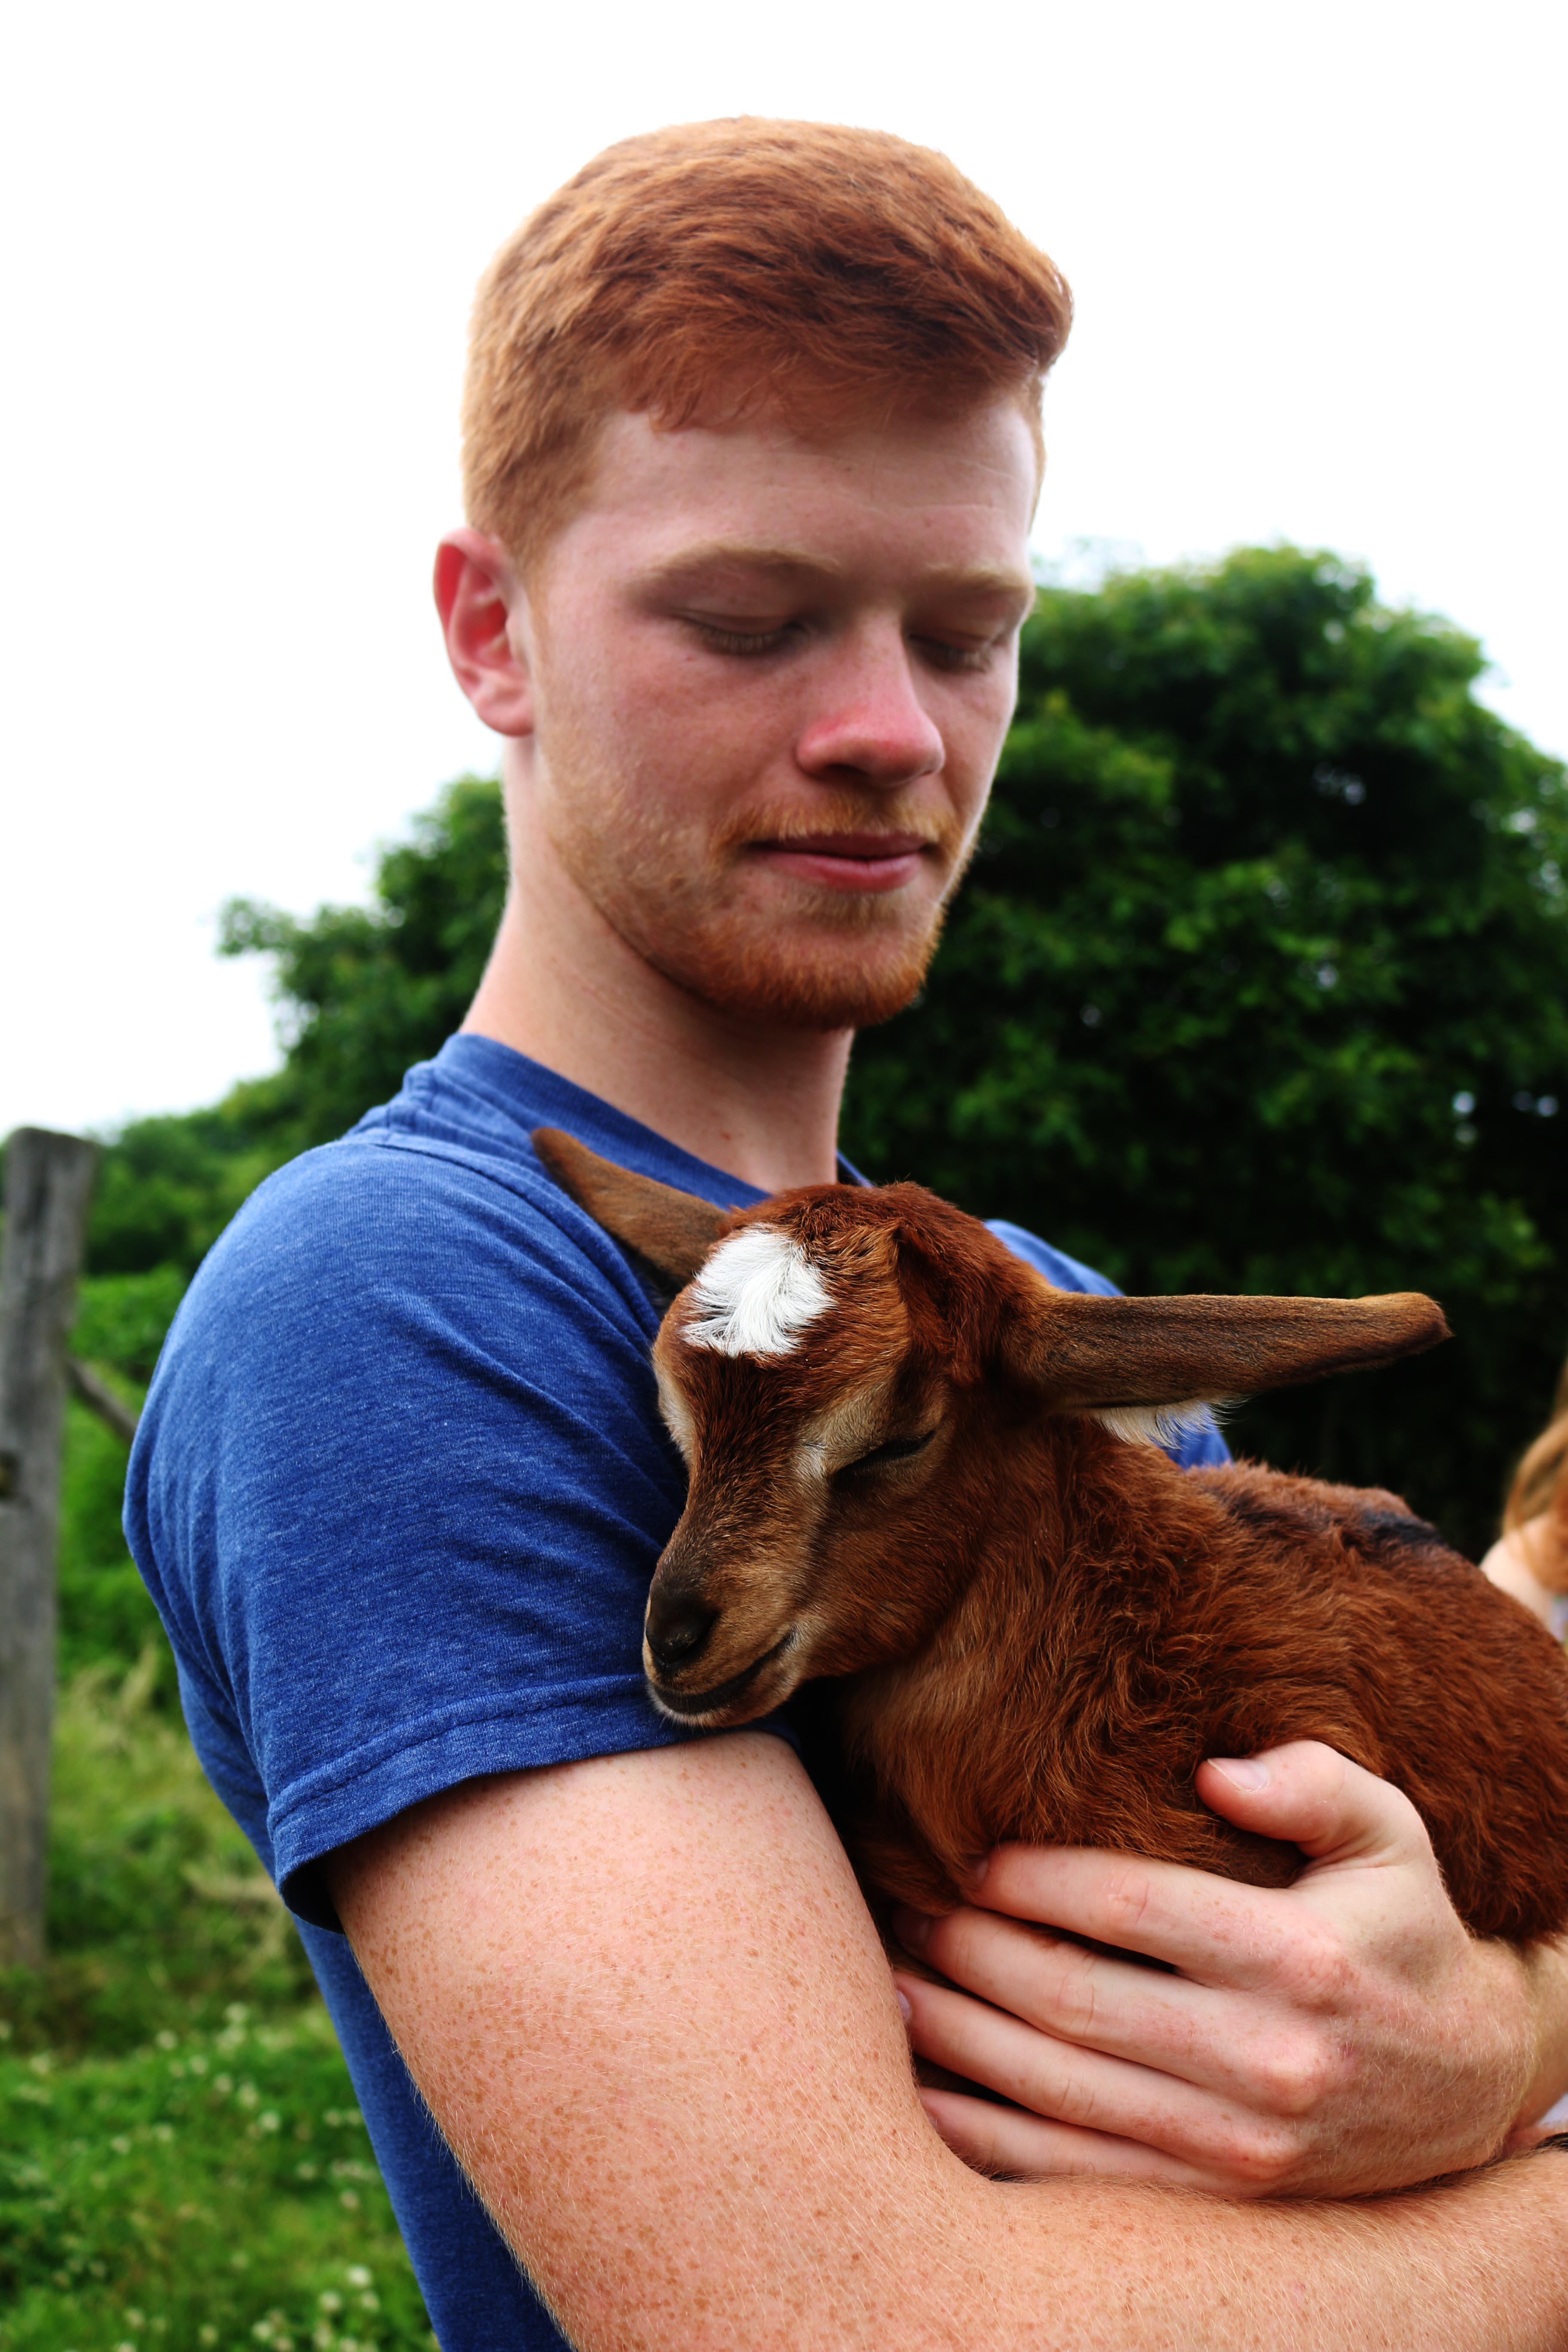 Owen at Owen's goat farm